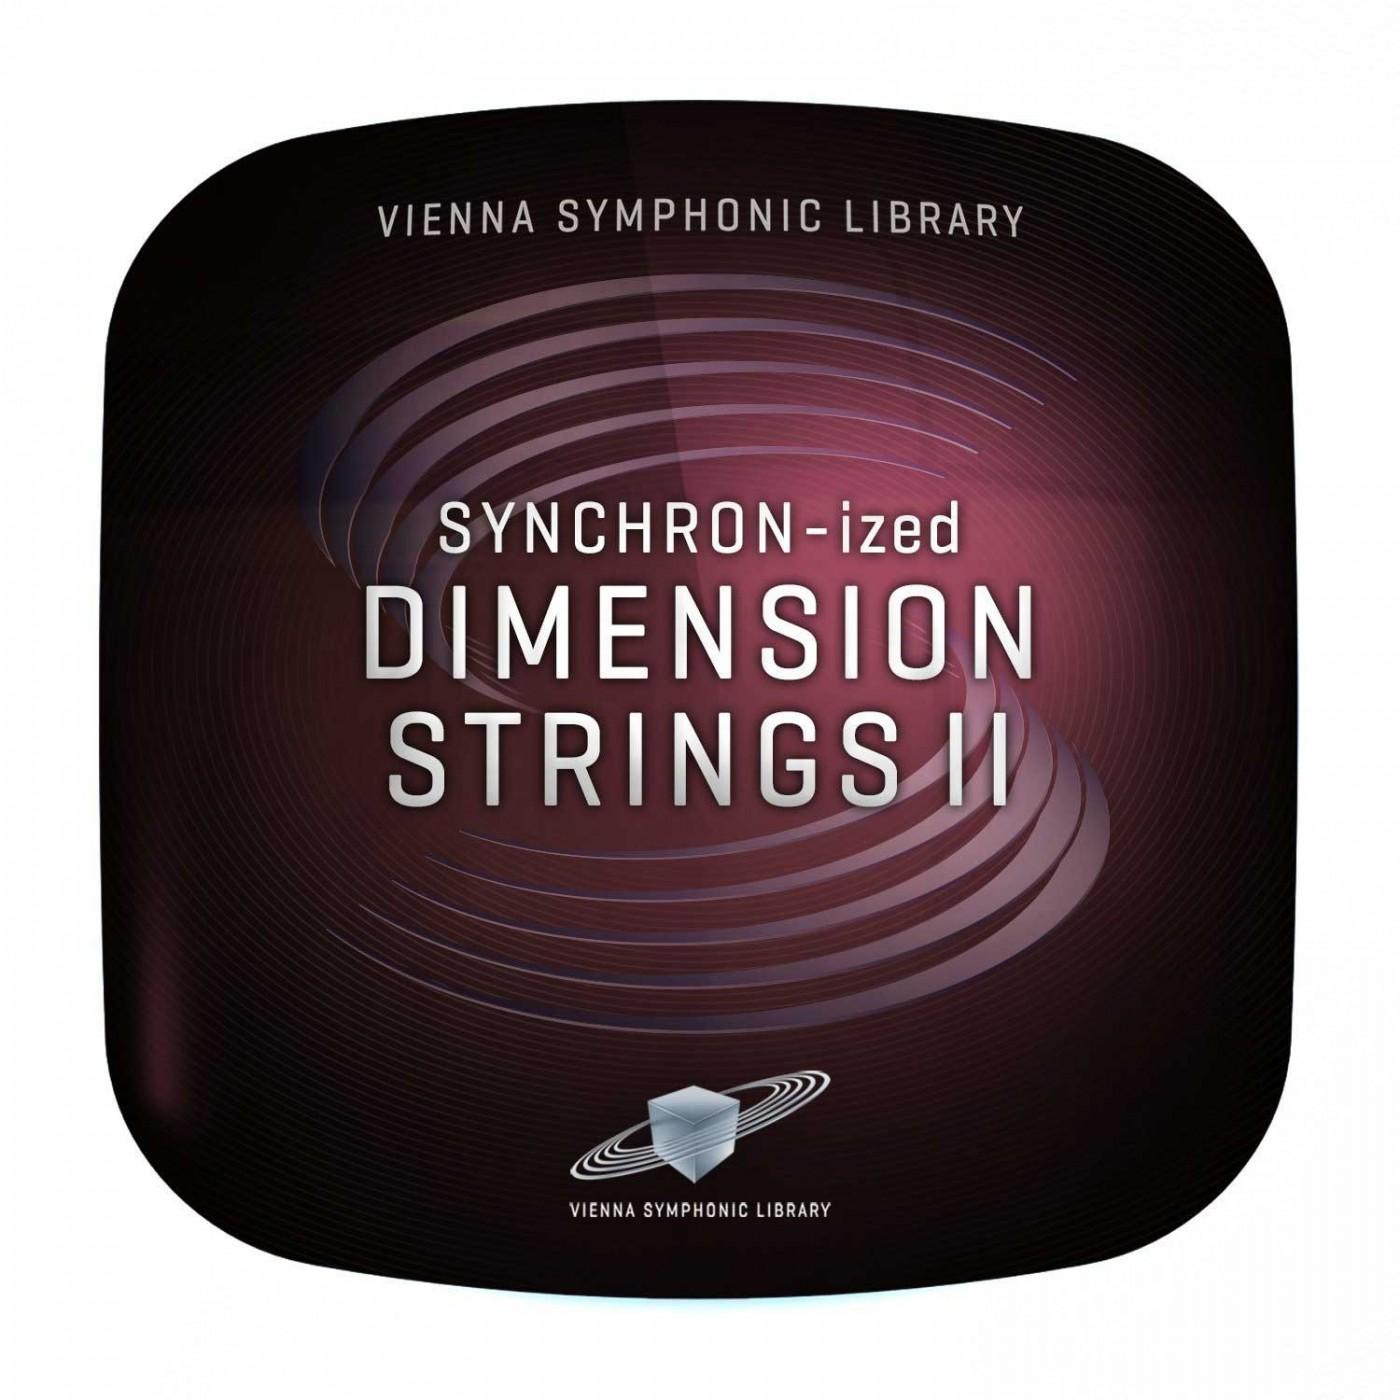 VSL SYNCHRON-ized DIMENSION STRINGS II